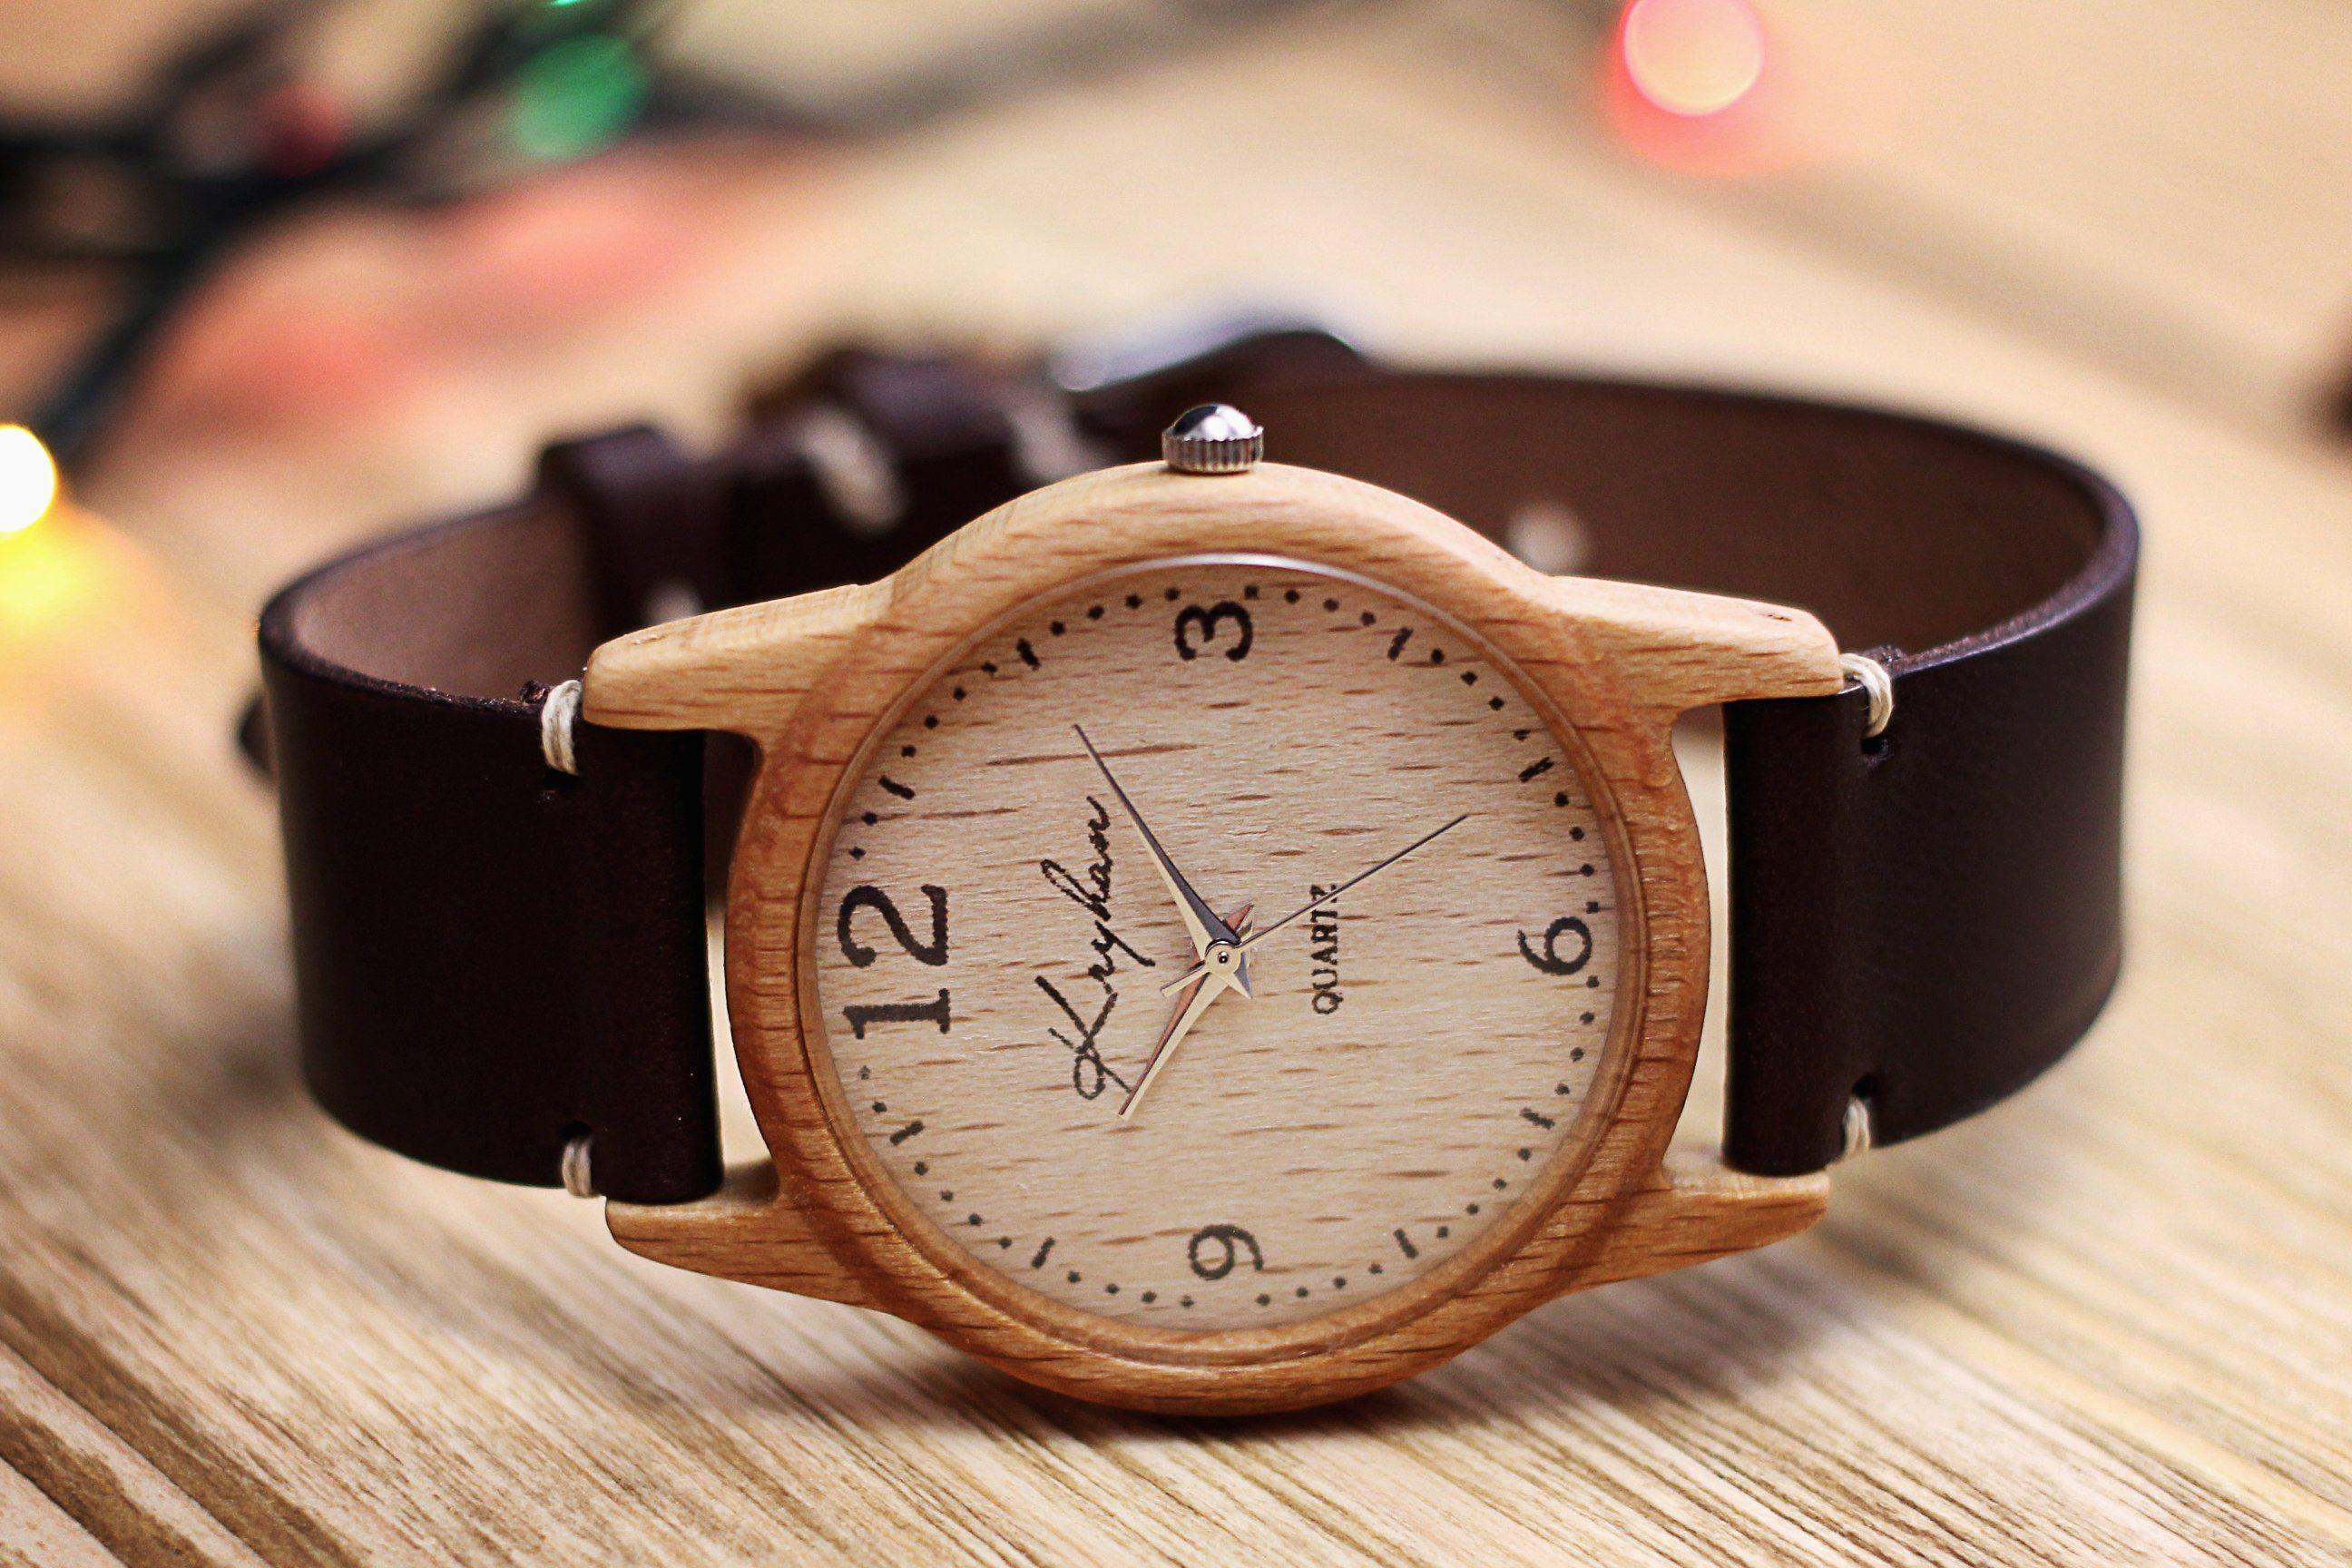 retro chronograph watches